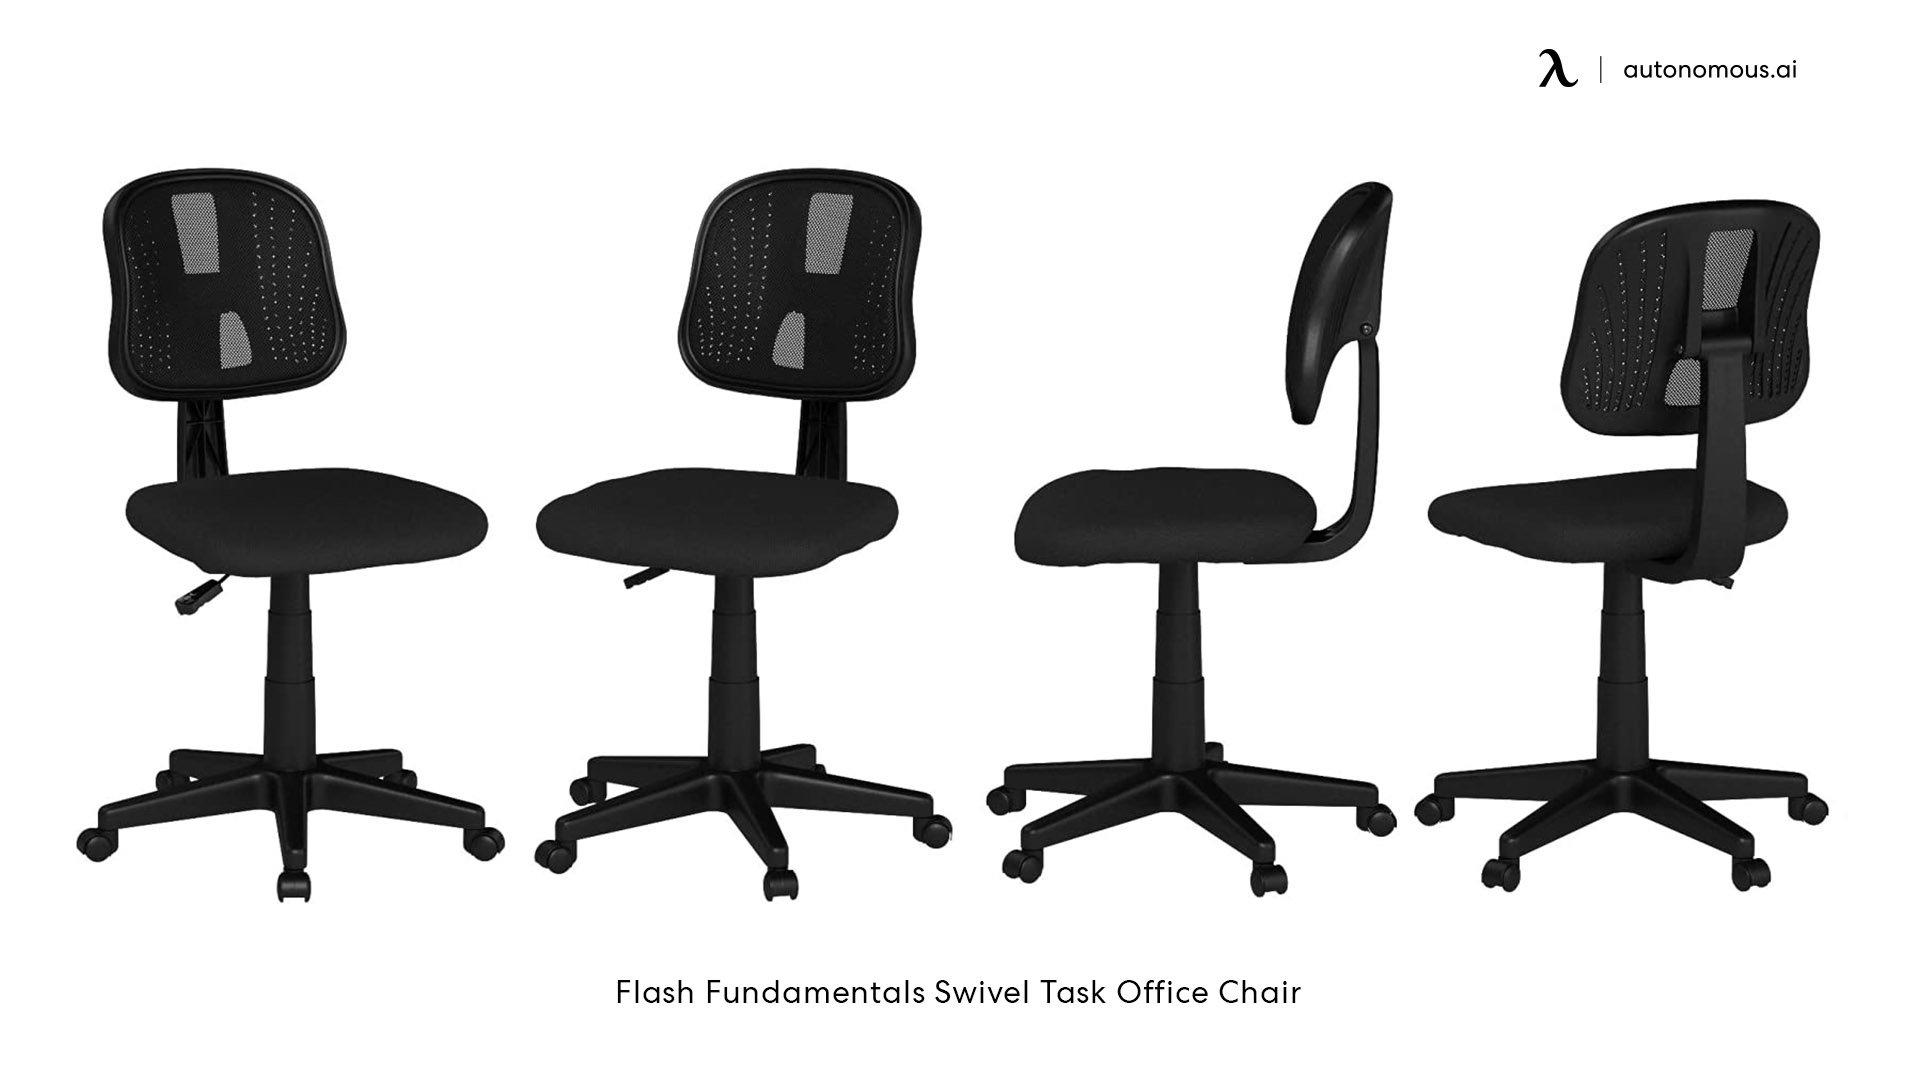 Swivel Ergonomic Task Chair from Flash Fundamentals